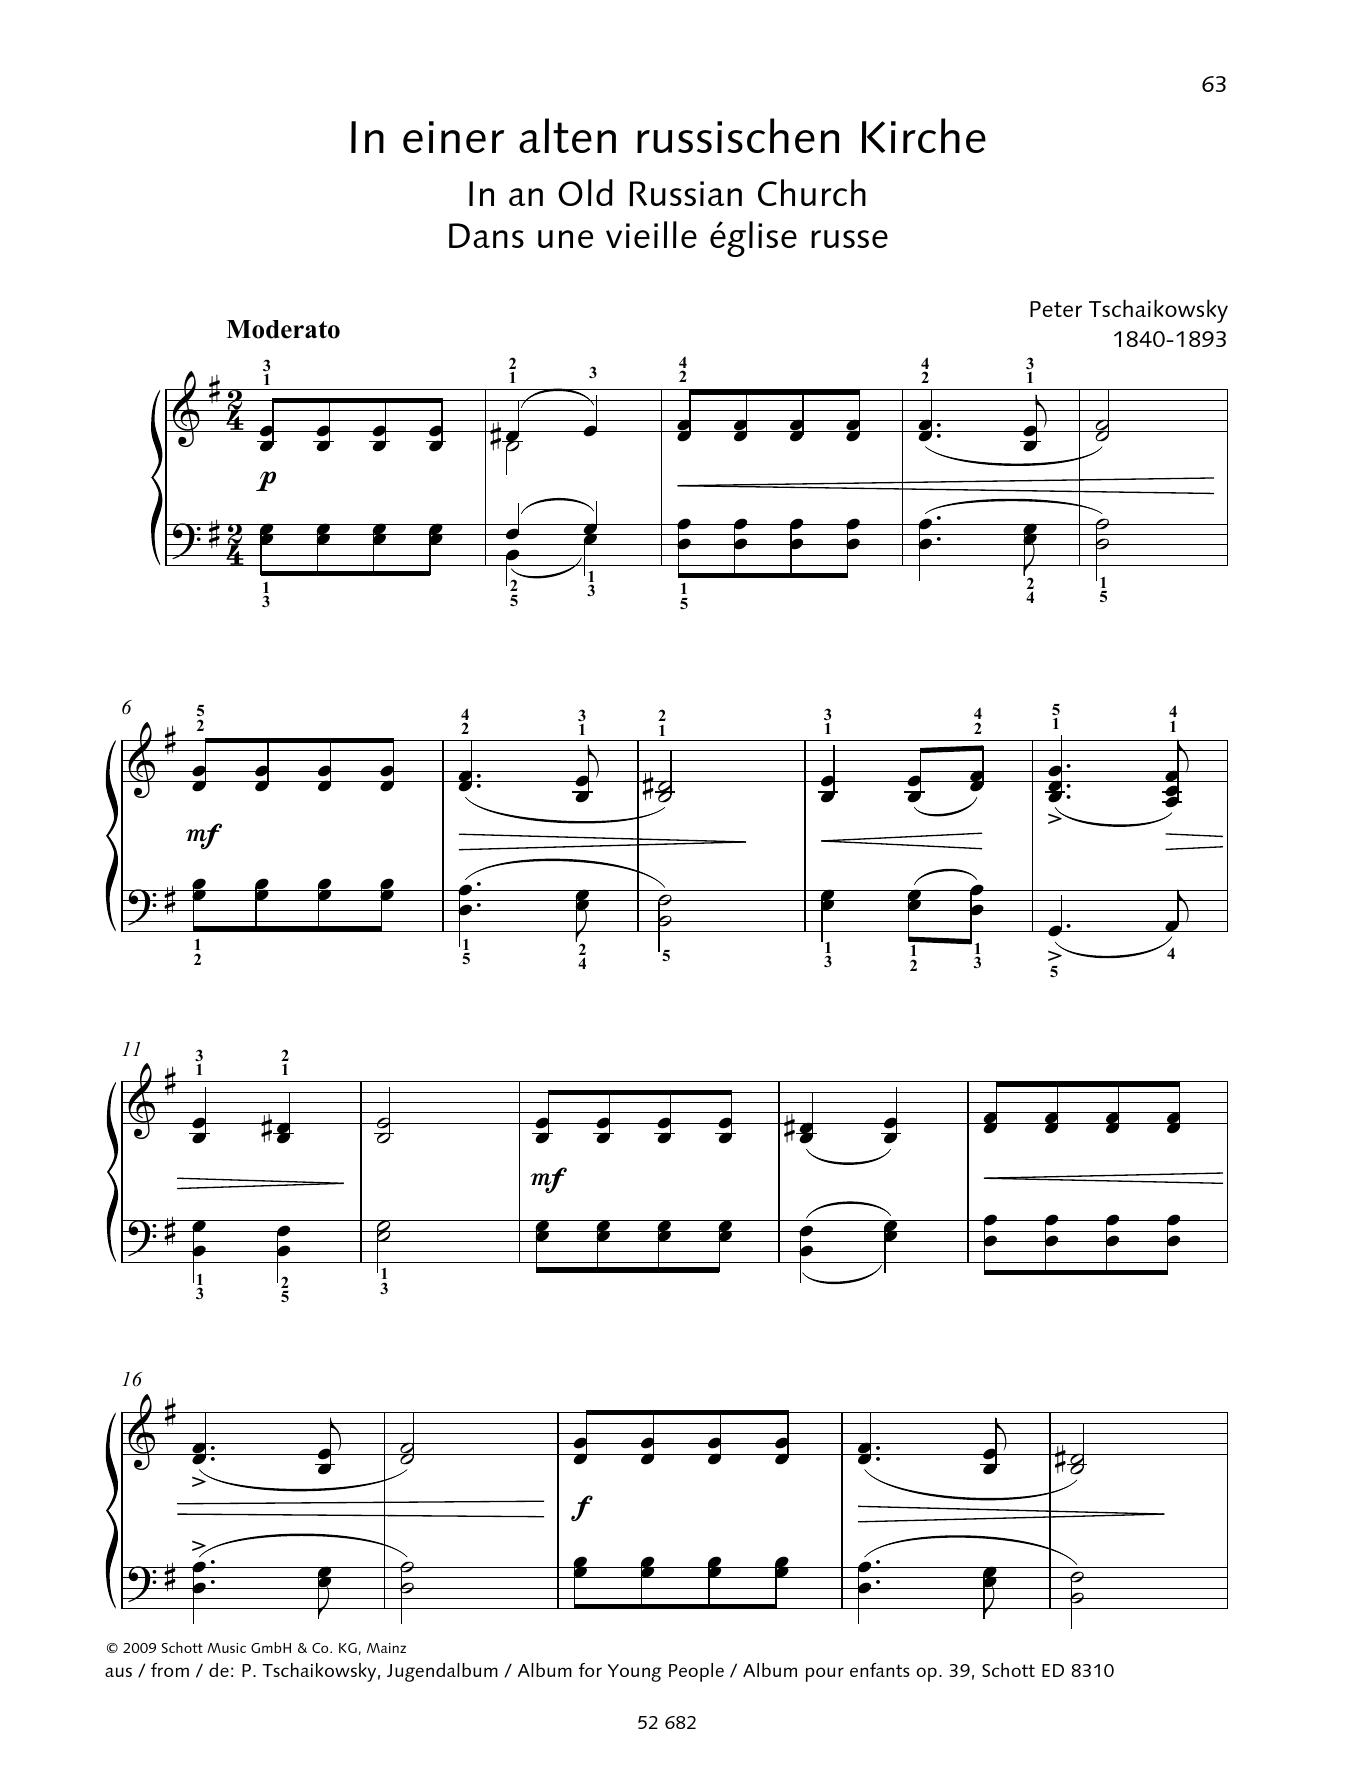 In an Old Russian Church Sheet Music